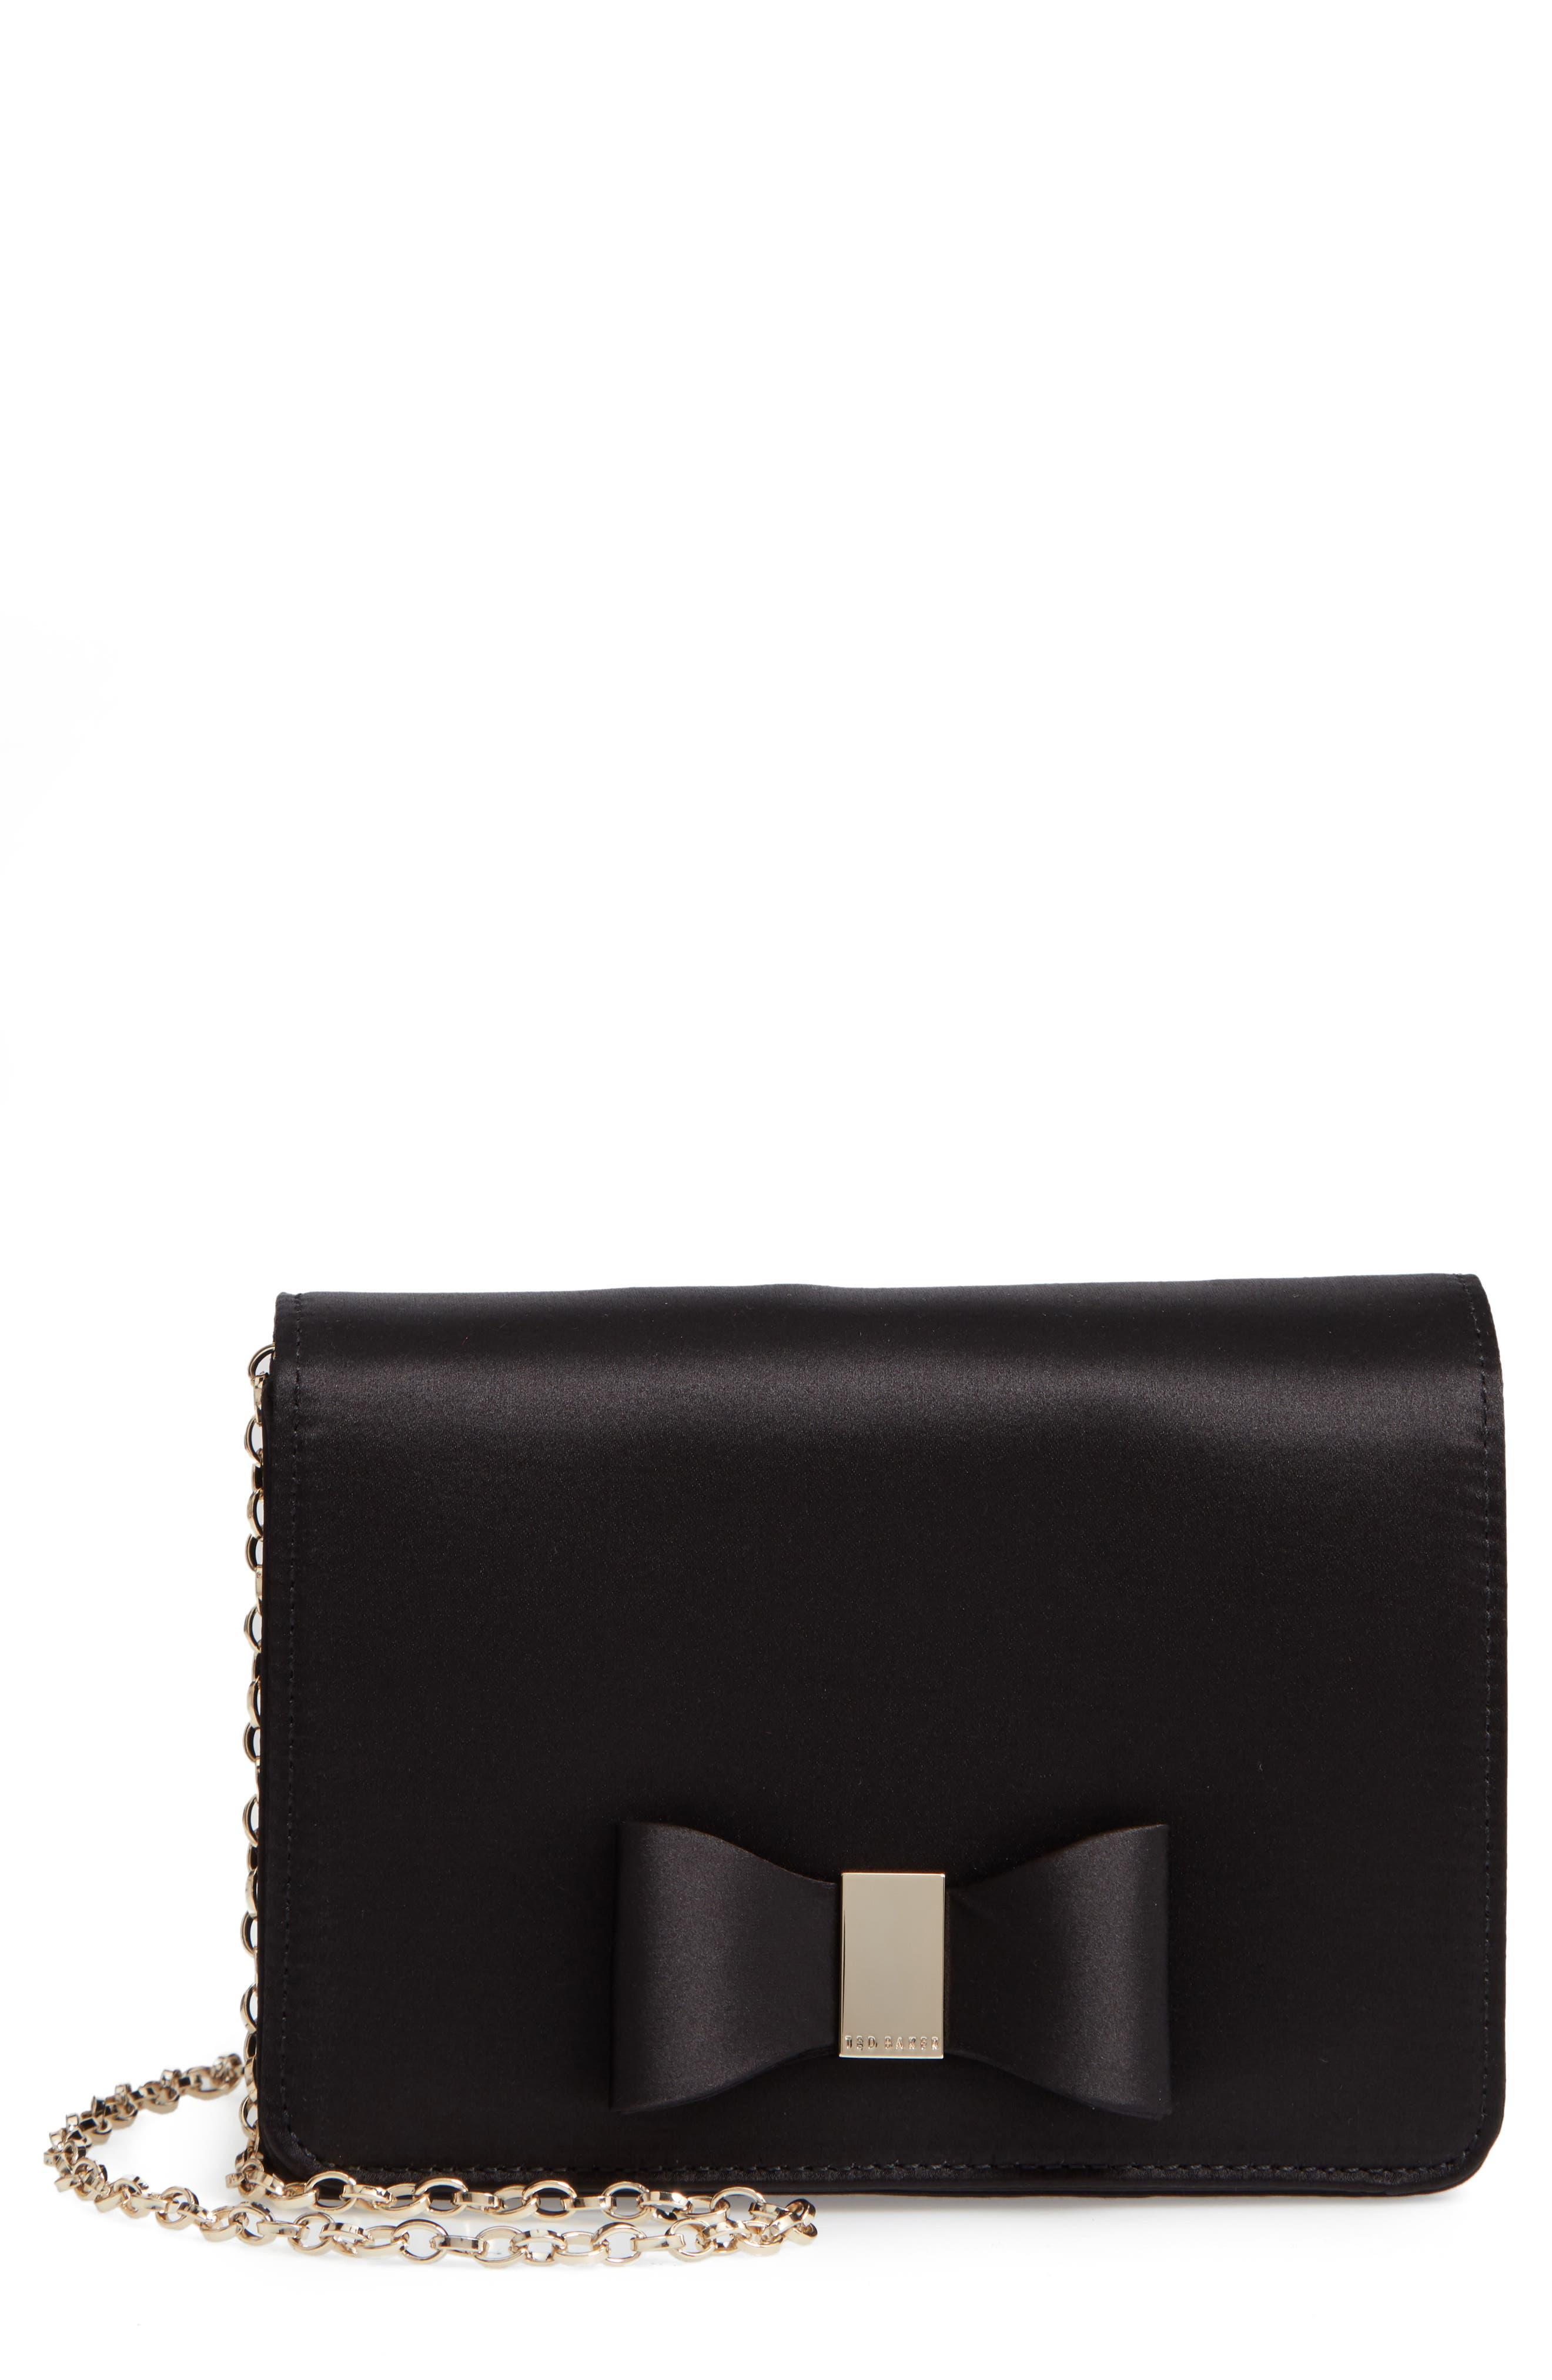 Eveelyn Bow Satin Evening Bag,                         Main,                         color, BLACK